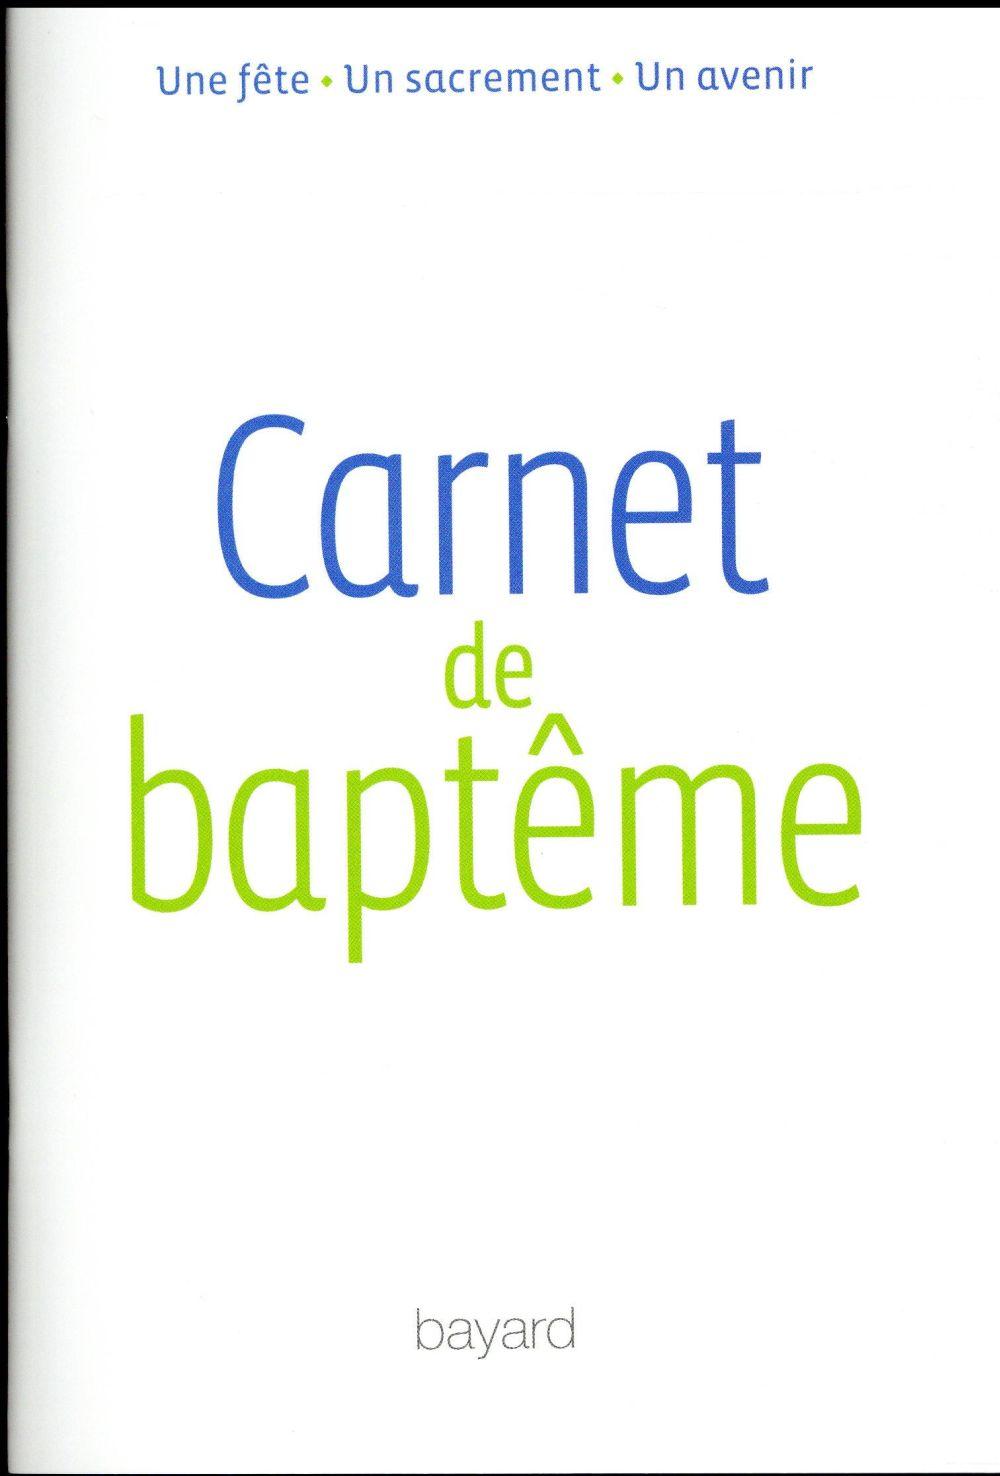 CARNET DE BAPTEME